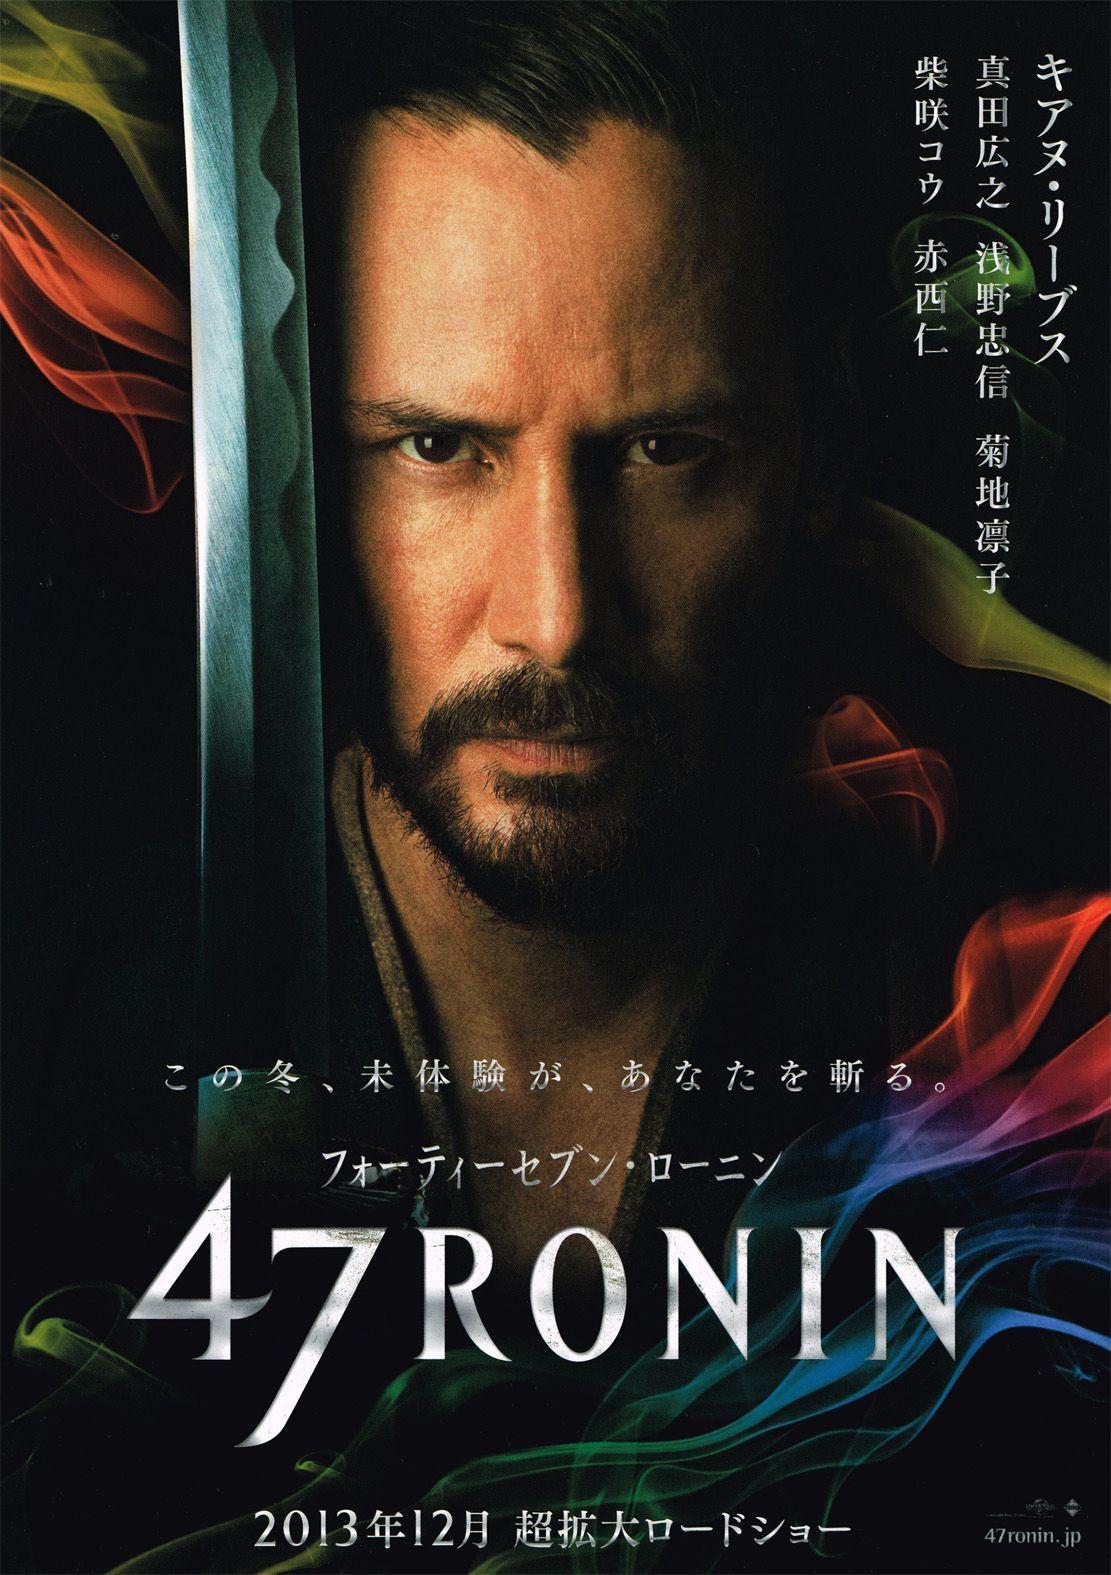 47 ronin full movie online free